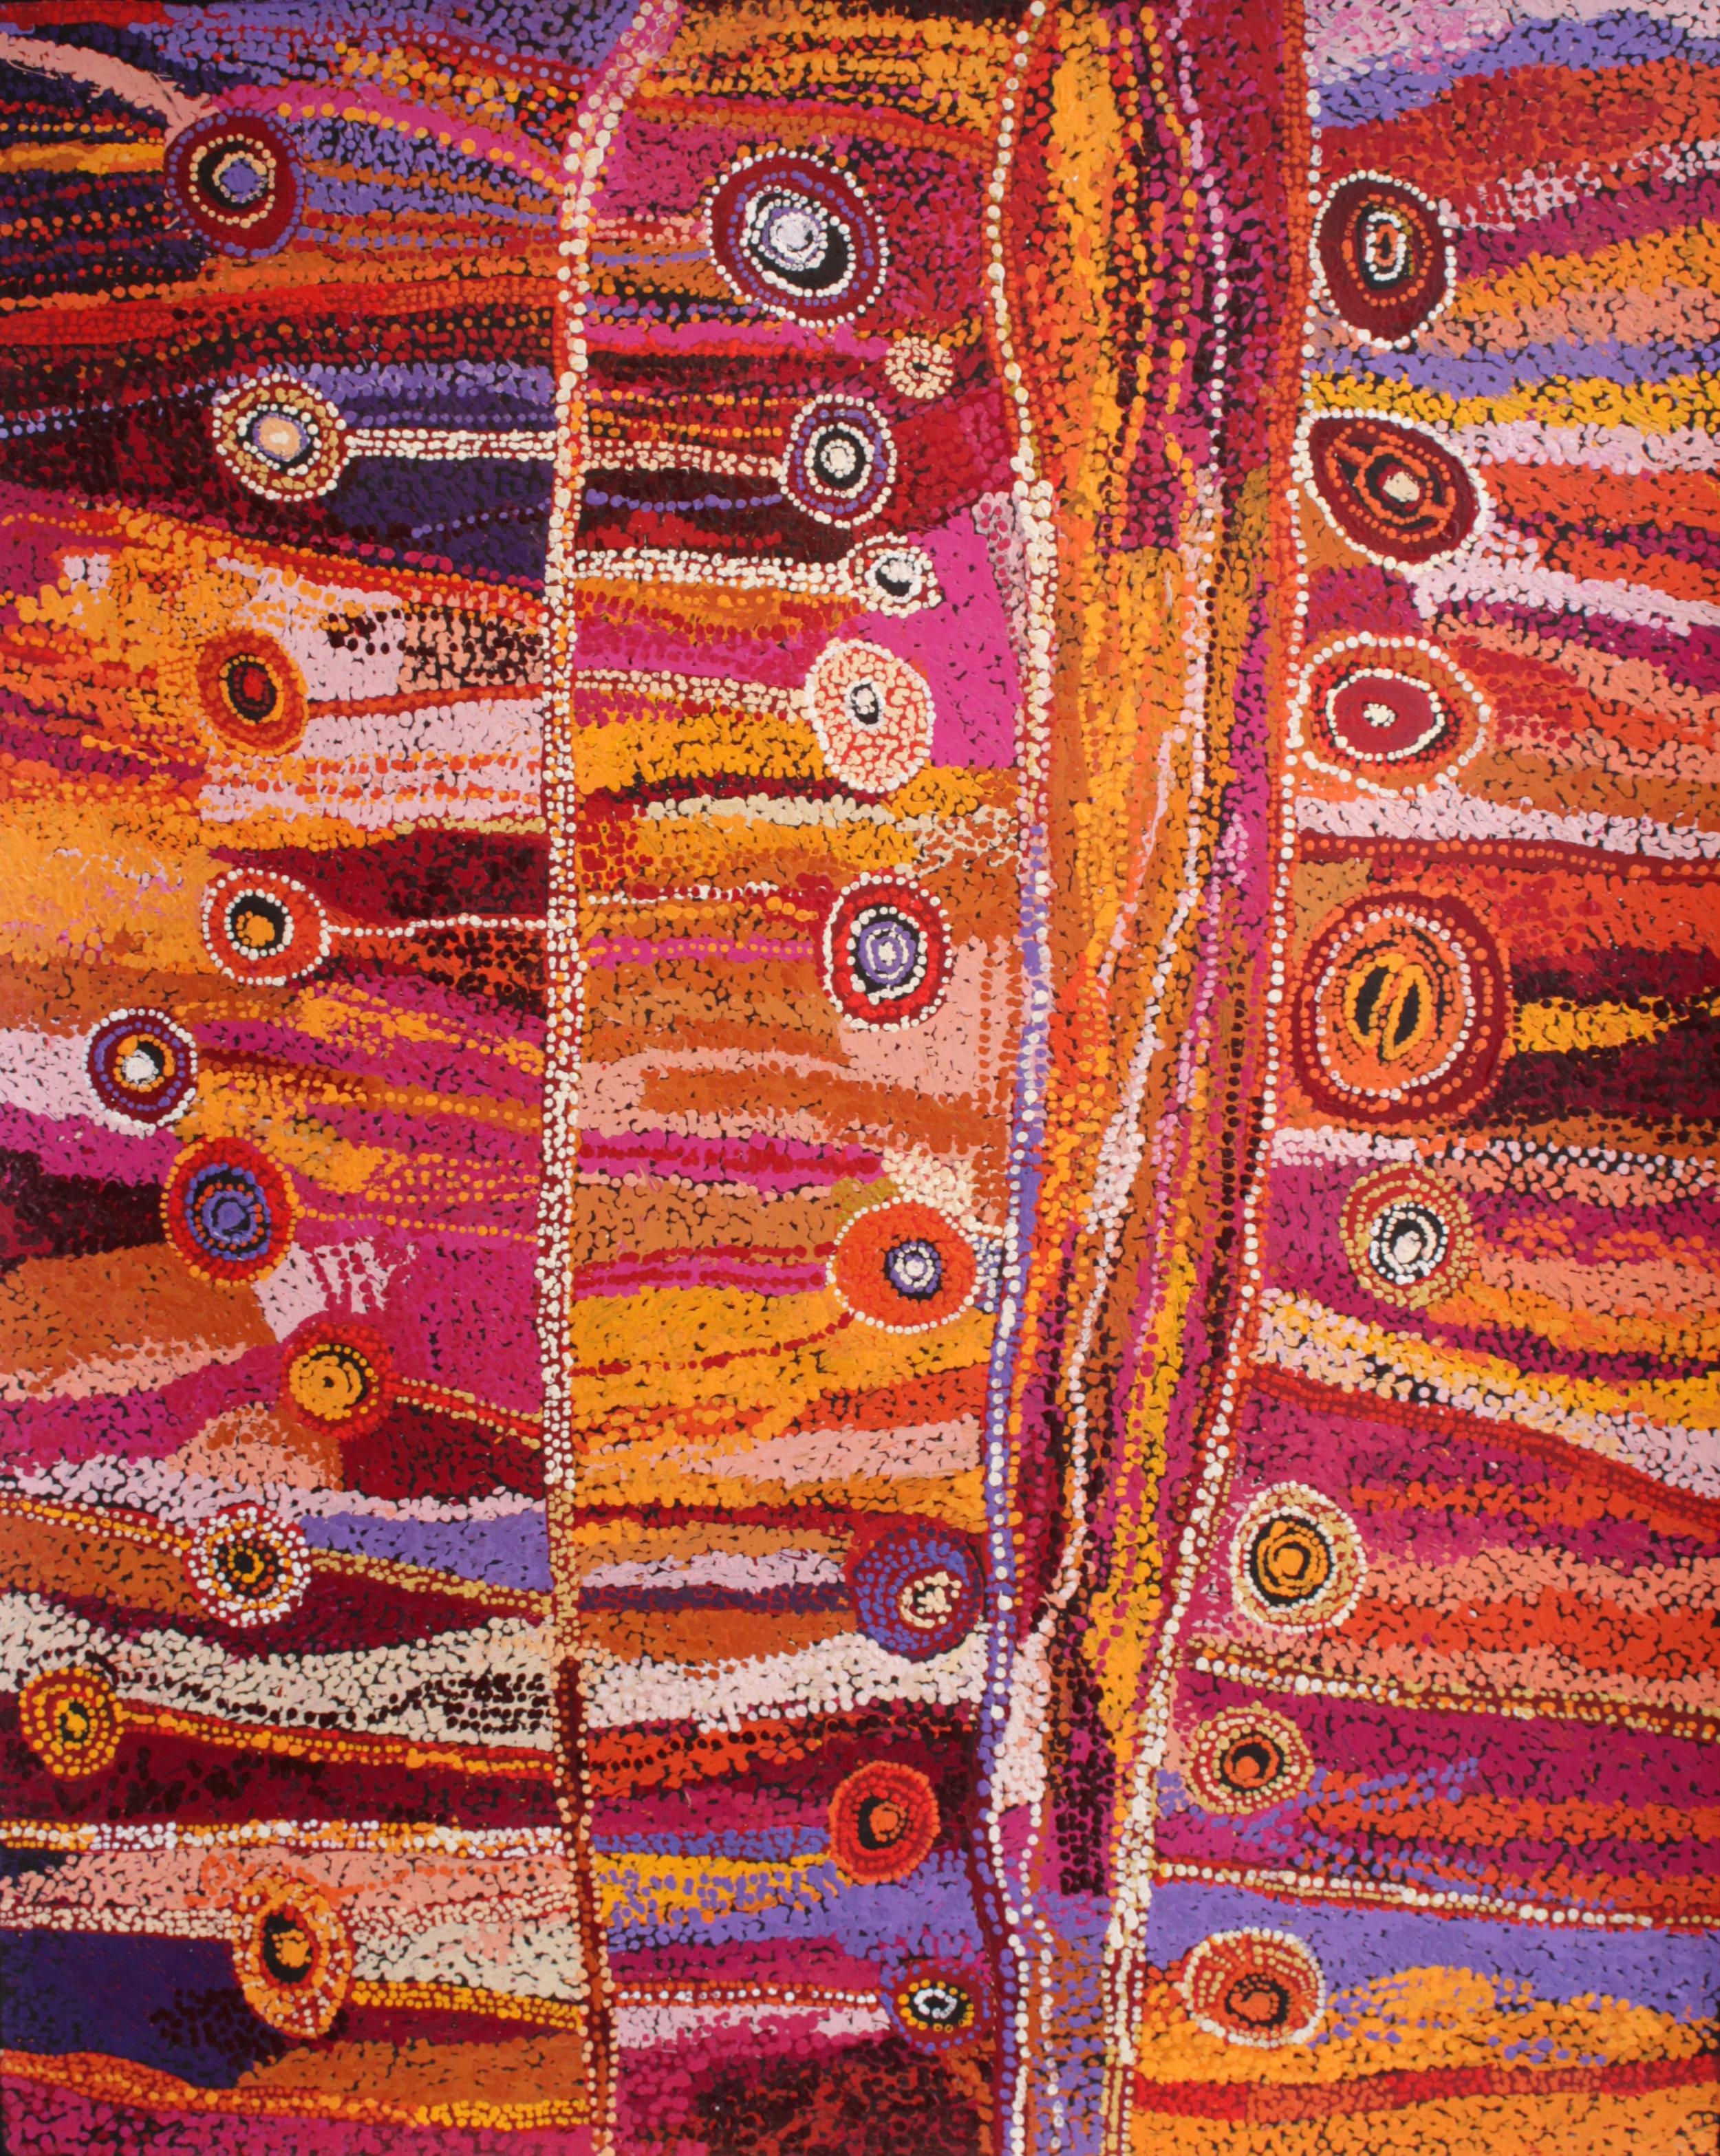 "Wawiriya Burton  Ngayuku Ngura - My Country  60"" x 48"" (152 x 122 cm) Tjala Arts Catalog #454-16   EMAIL INQUIRY"